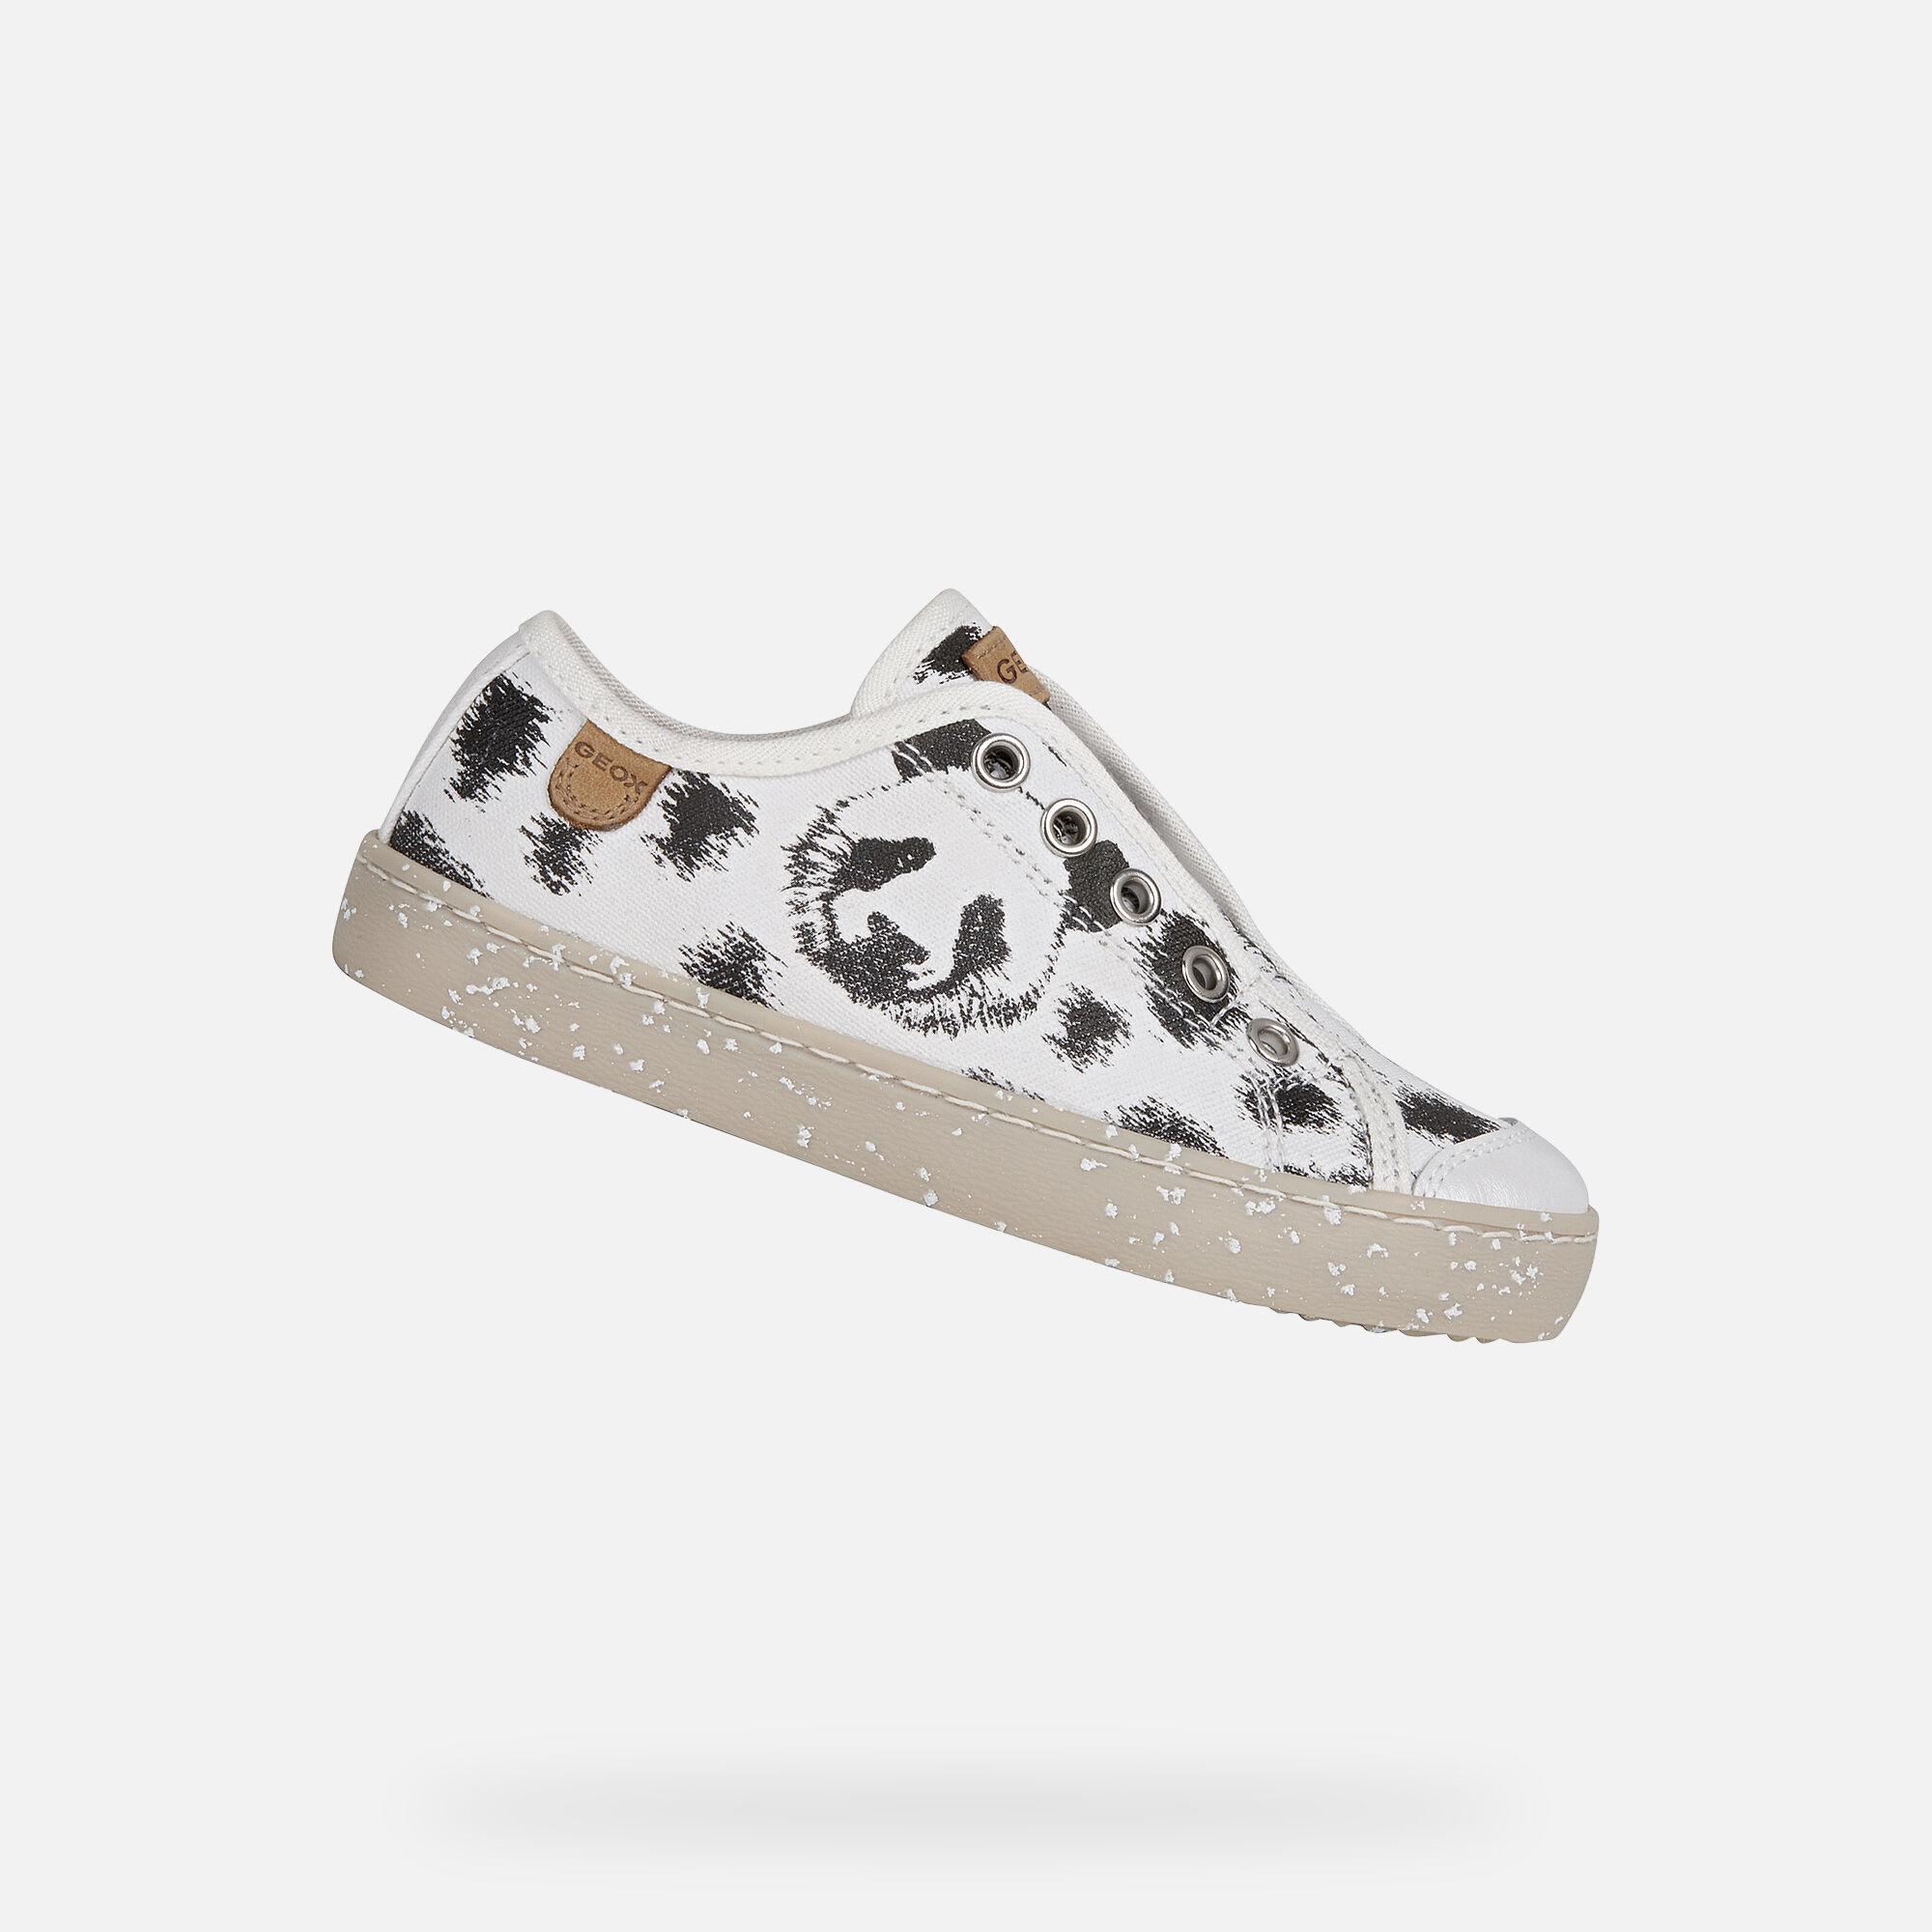 Geox Kids Kilwi Girl 11 Sneaker